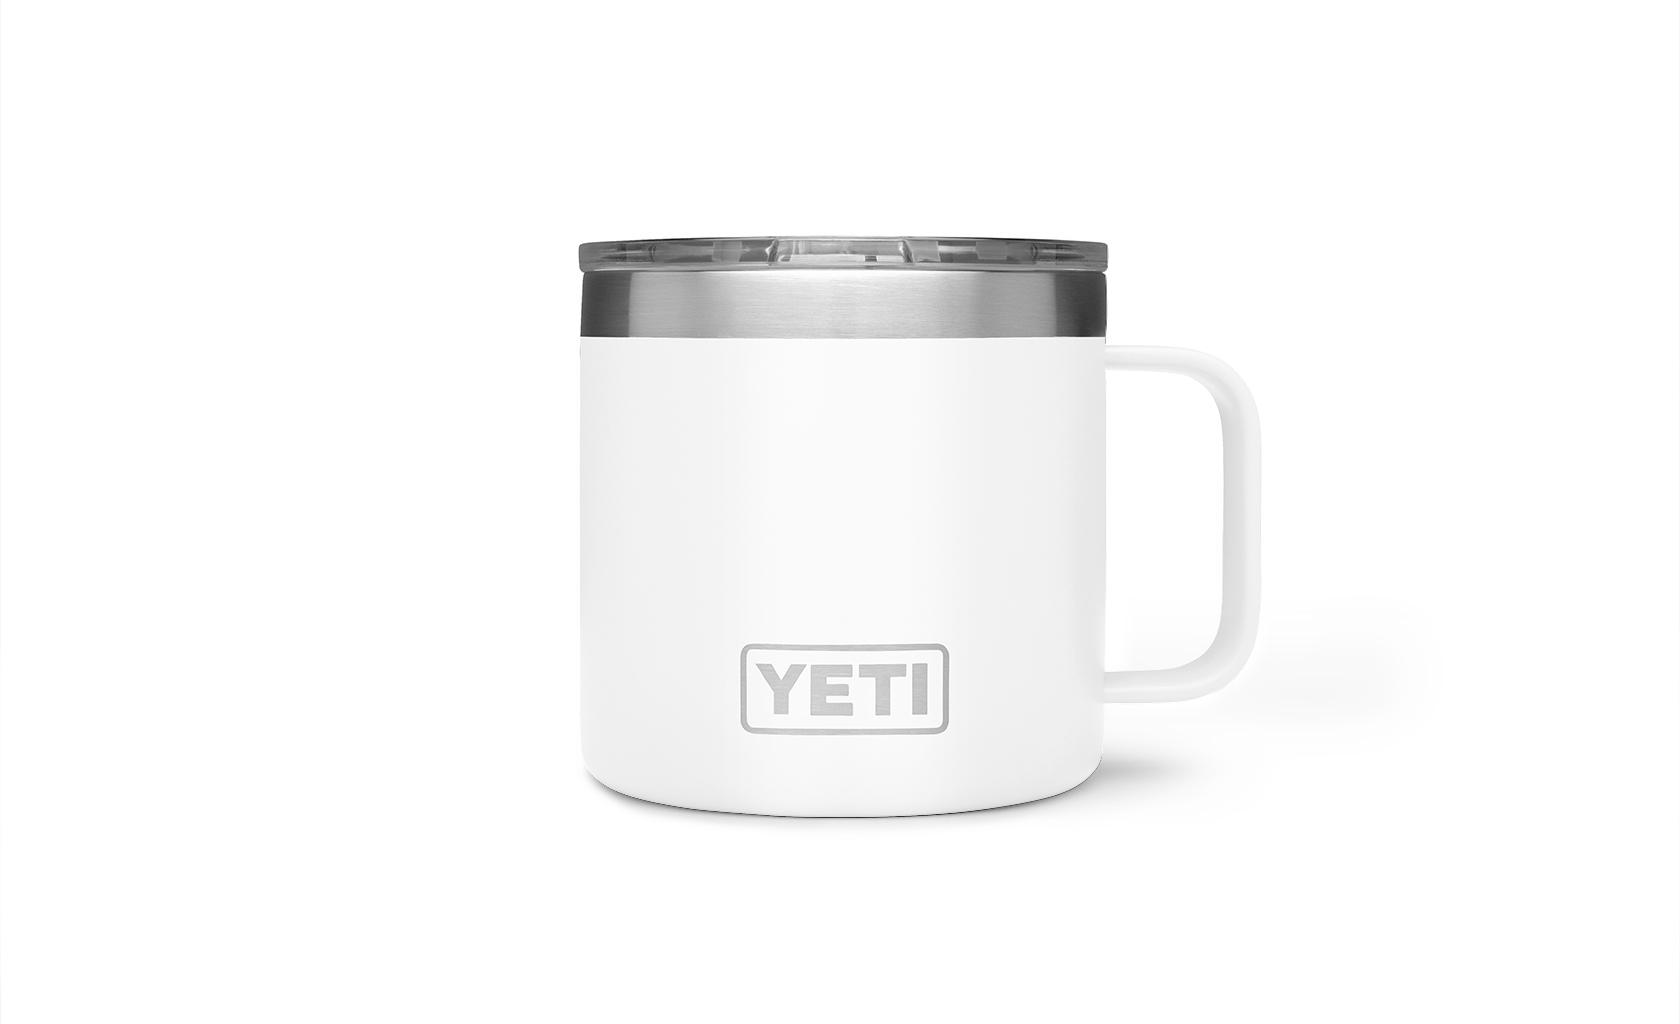 Yeti 14 oz mug white